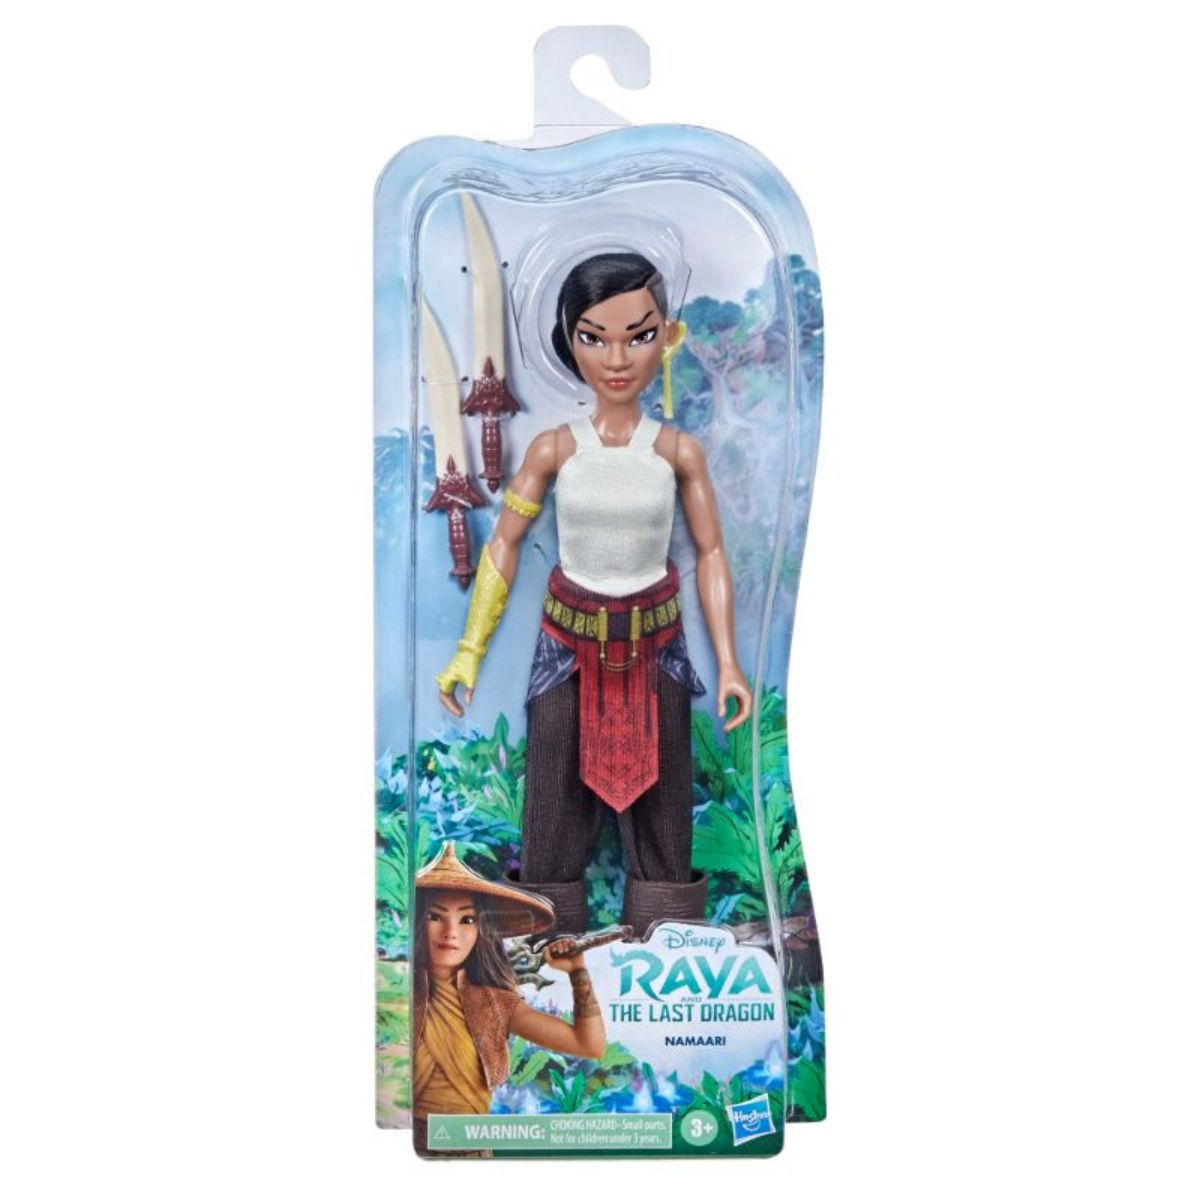 Papusa Disney Raya and the Last Dragon, Namaari, E9570